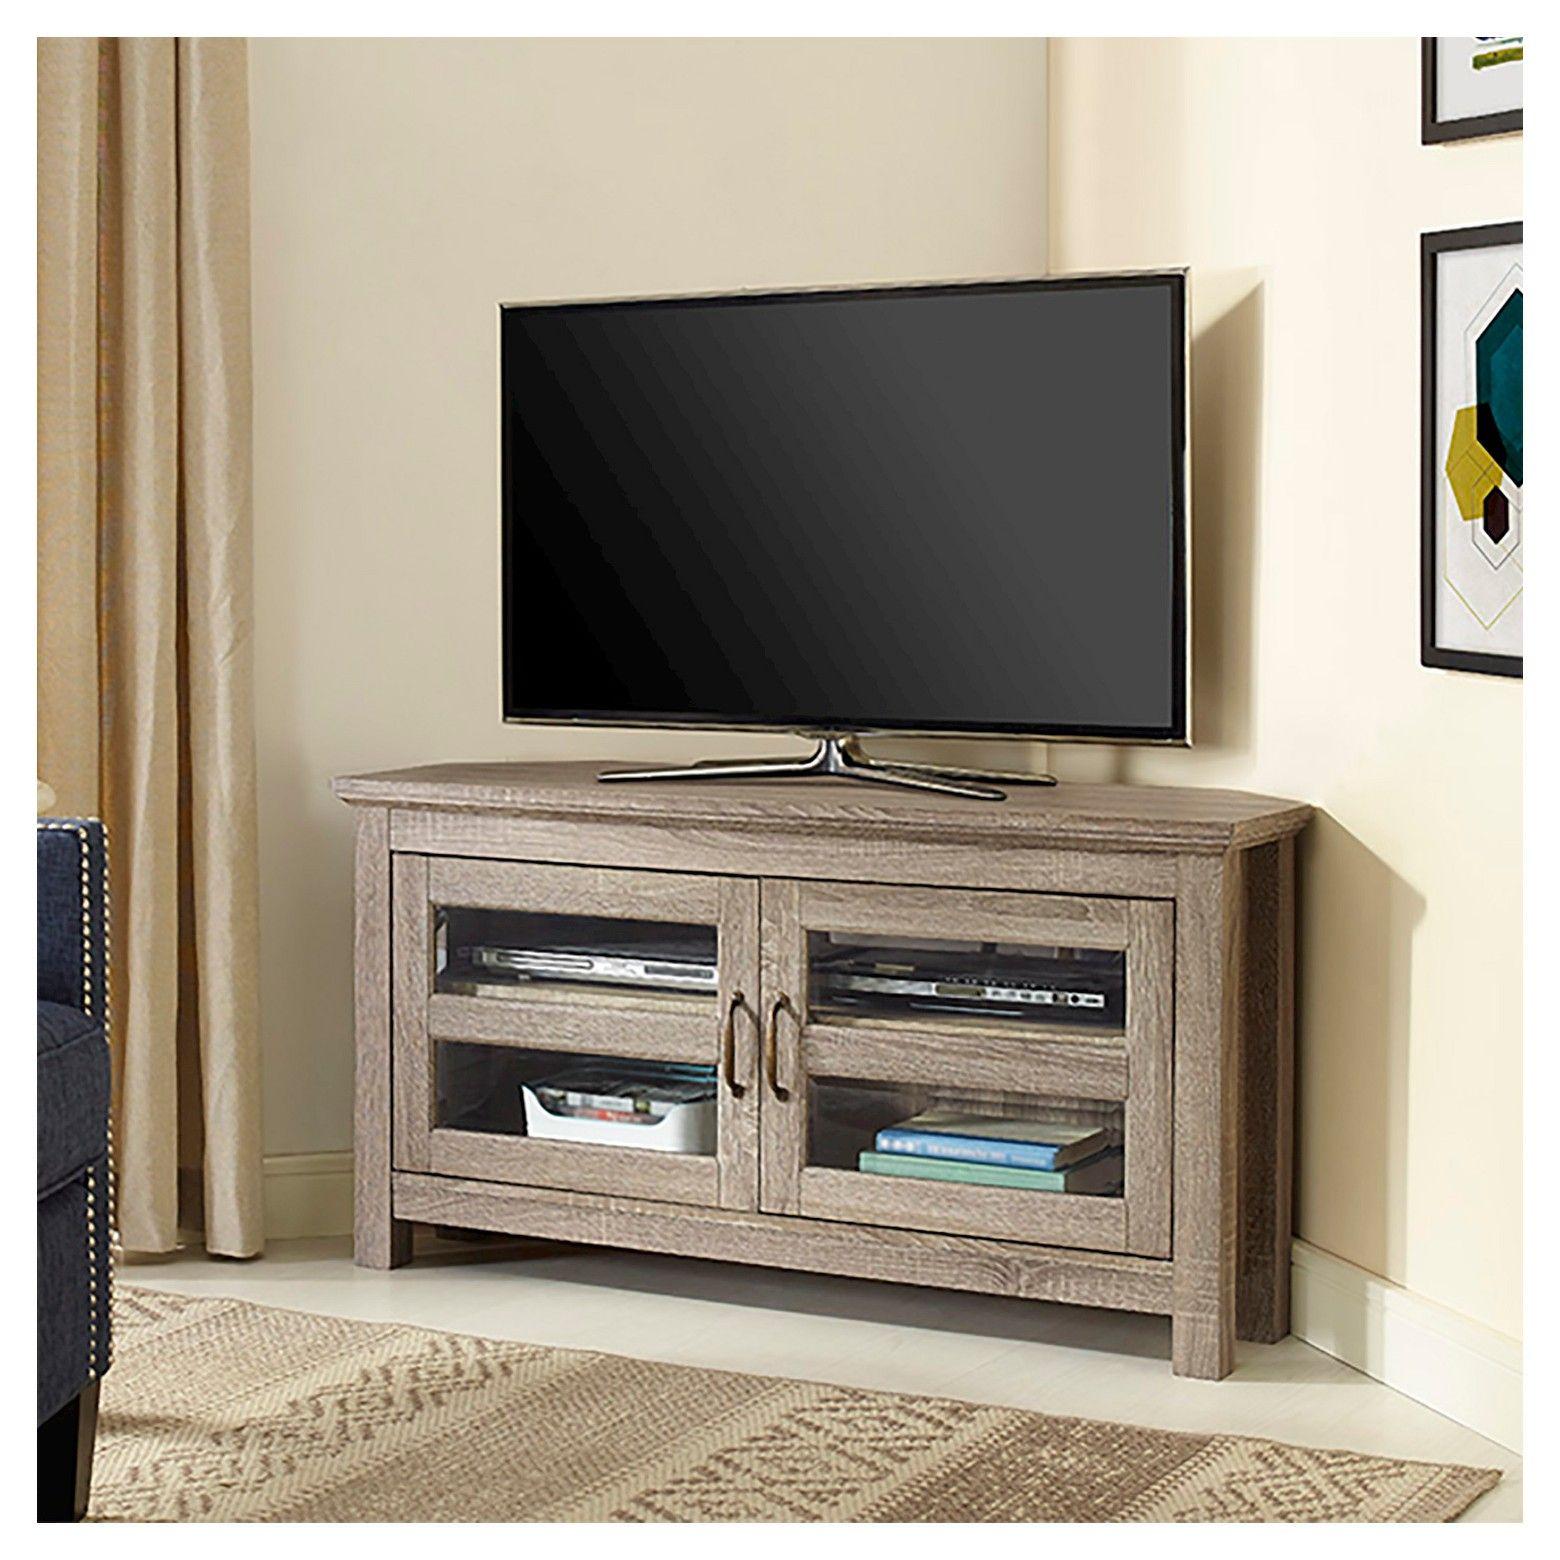 Modern 2 Glass Door Corner Tv Stand For Tvs Up To 50 Driftwood Saracina Home Wood Corner Tv Stand Black Corner Tv Stand Tv Stand Furniture